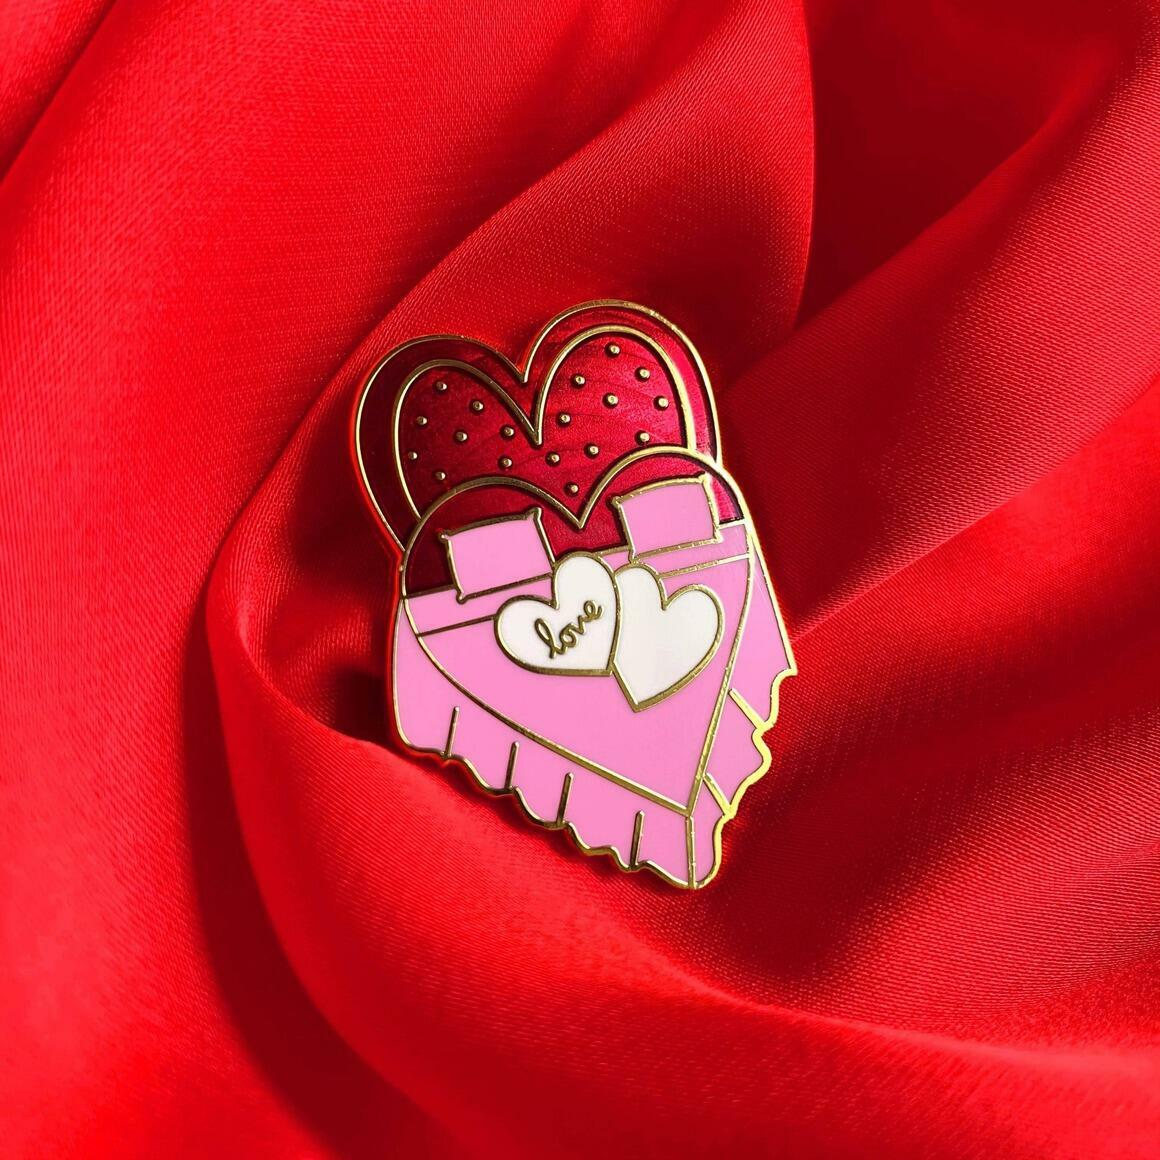 Heart Shaped Bed Pin   Trada Marketplace